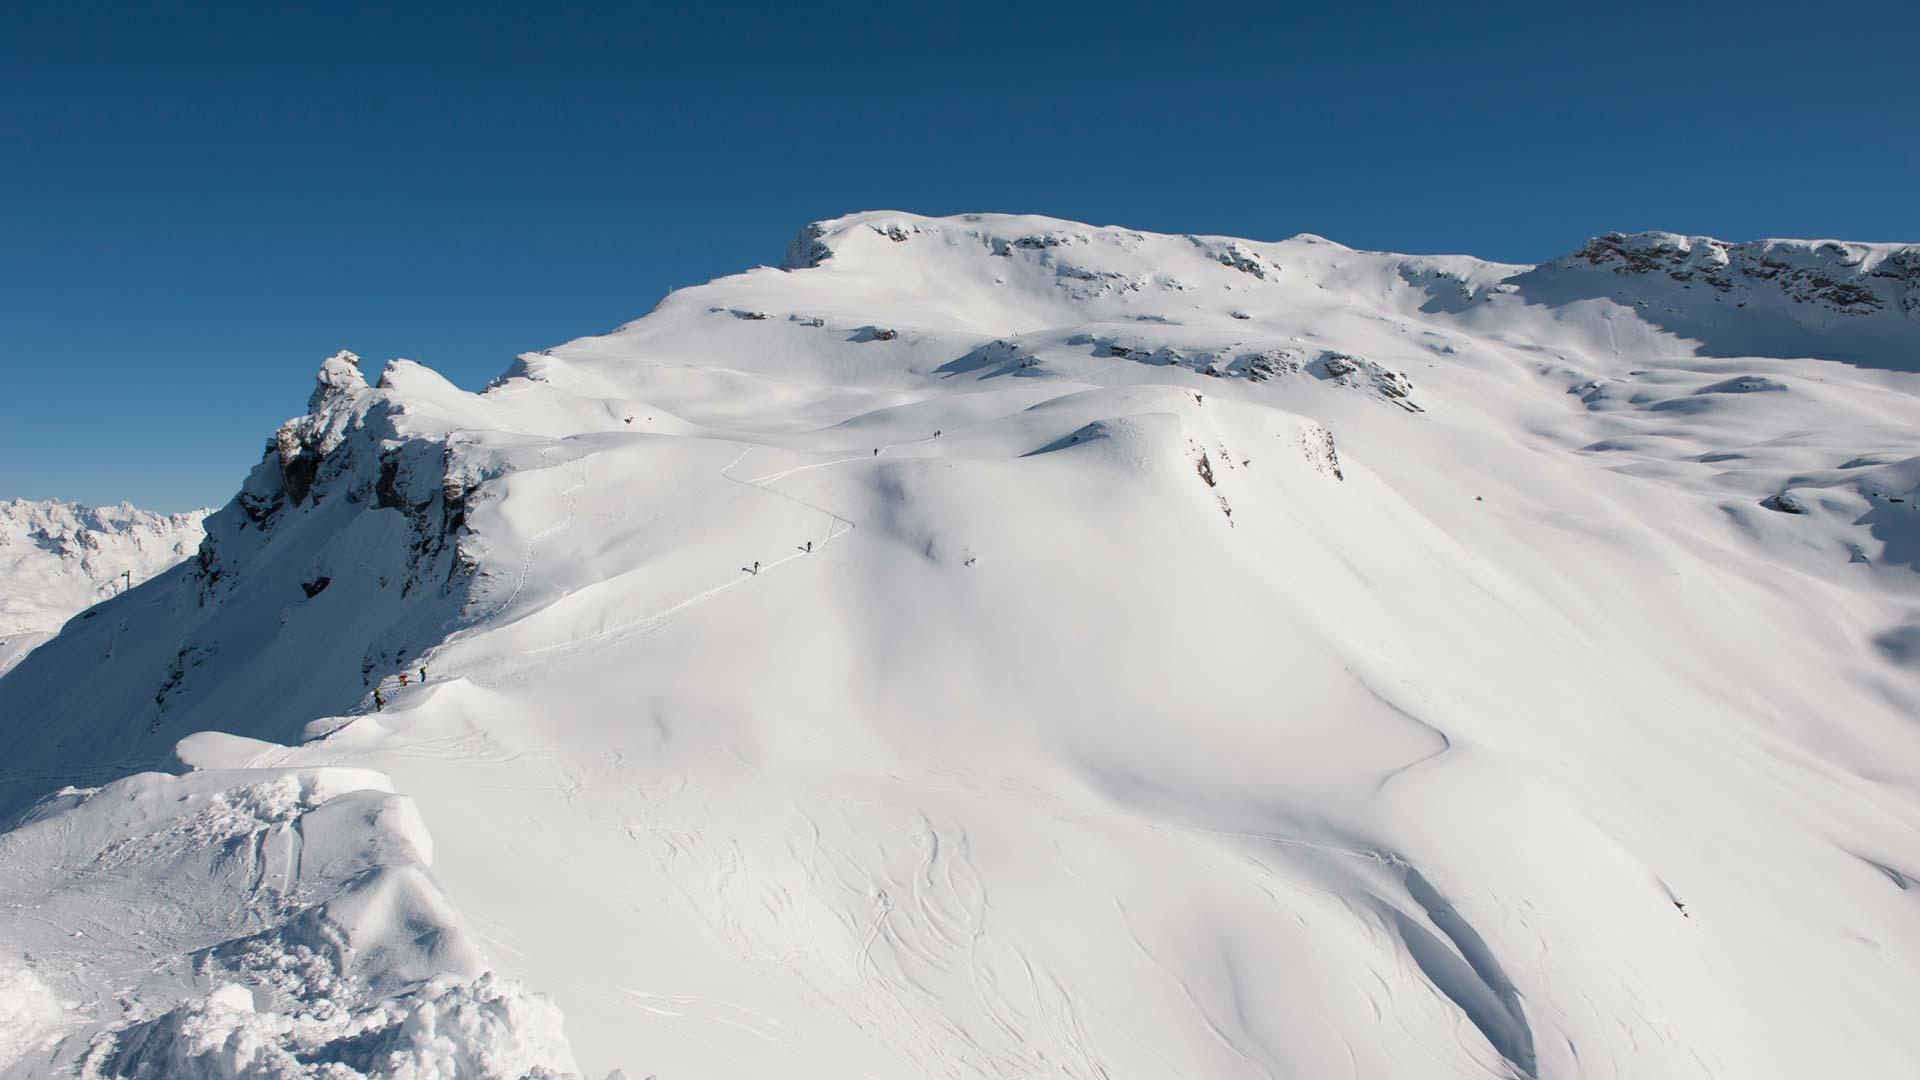 Skiers hiking to the top of Fogliettaz in Sainte Foy